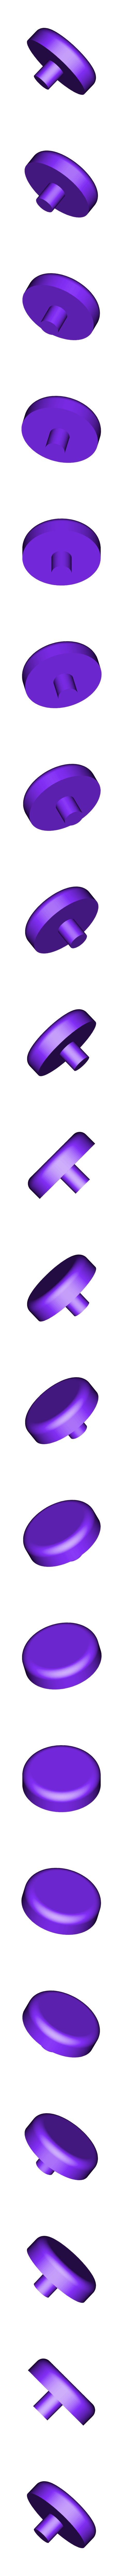 petal-poleA2.stl Download free STL file Mechnolia • 3D printing template, ChrisBobo